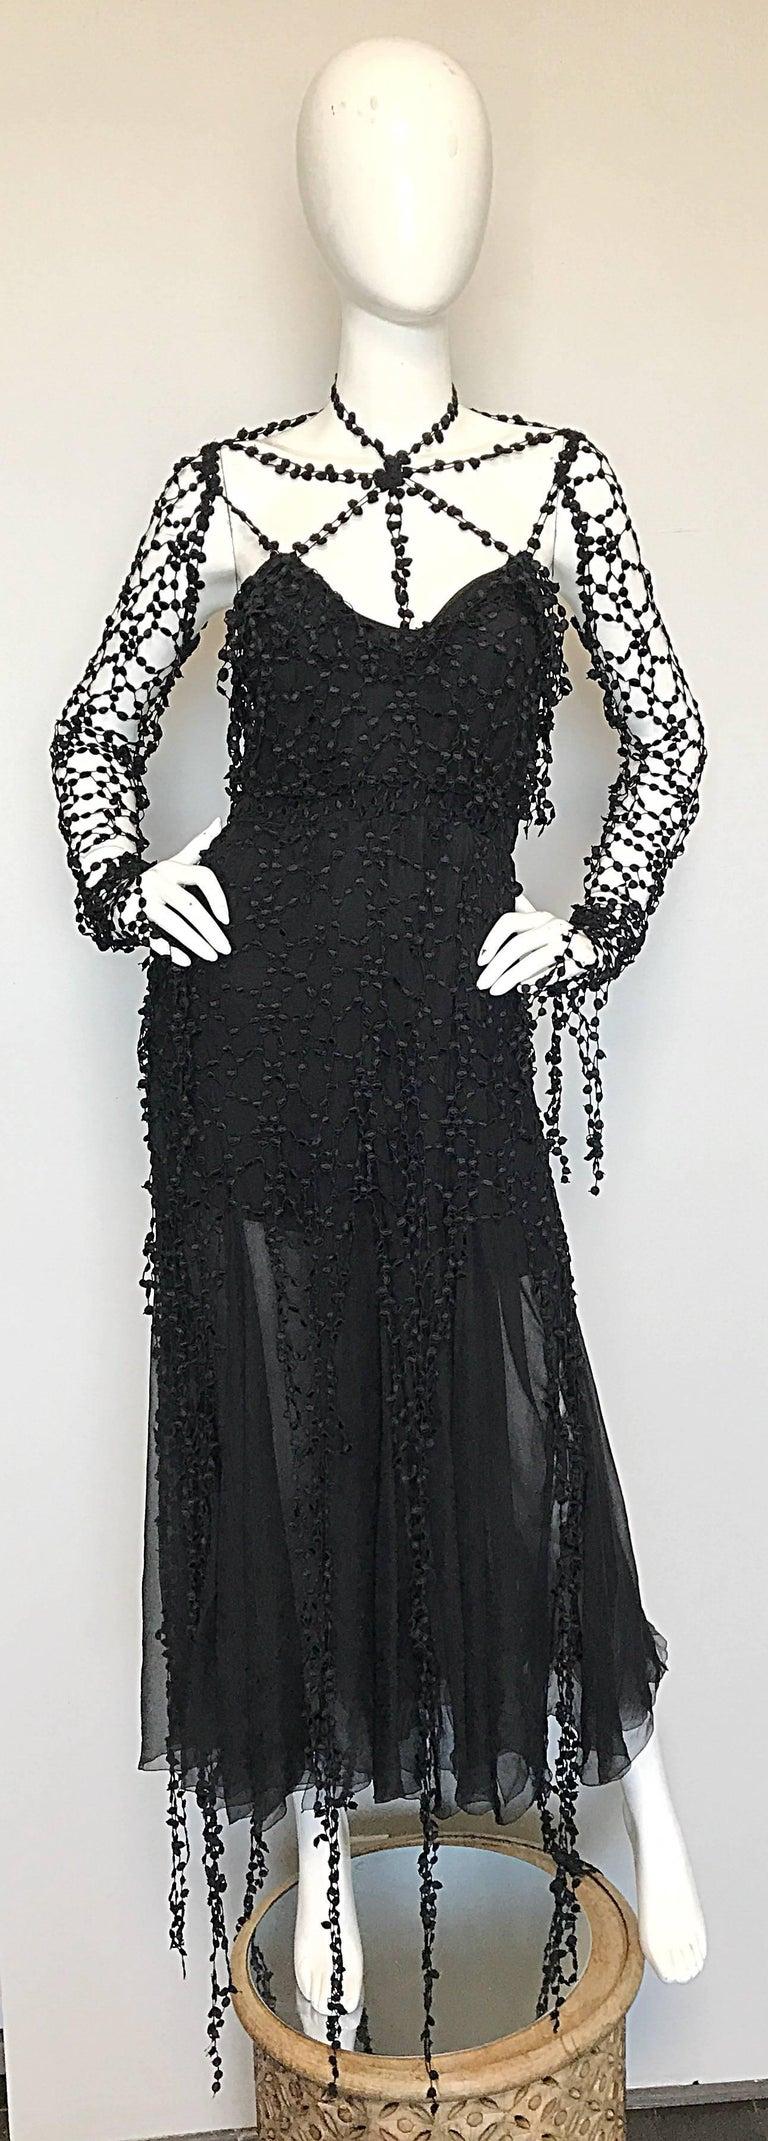 1990s Karl Lagerfeld Vintage ' Spiderweb ' Black Silk Chiffon Vintage 90s Dress 9